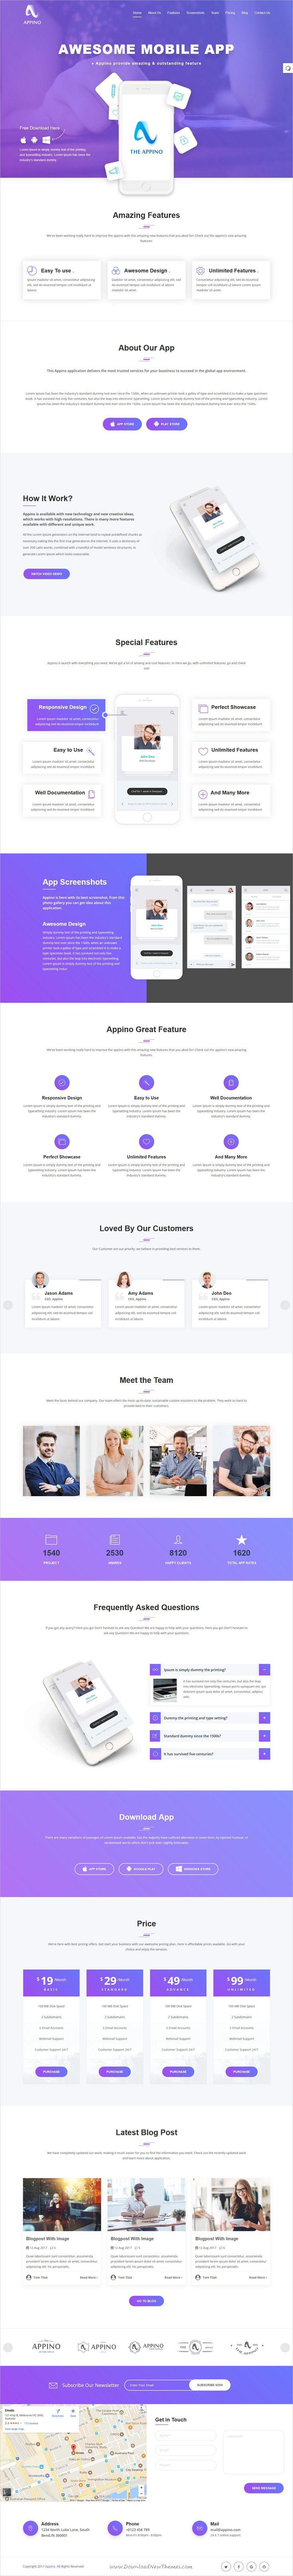 The Best Web Templates Images On Pinterest Website Designs - Fresh podcast website template scheme